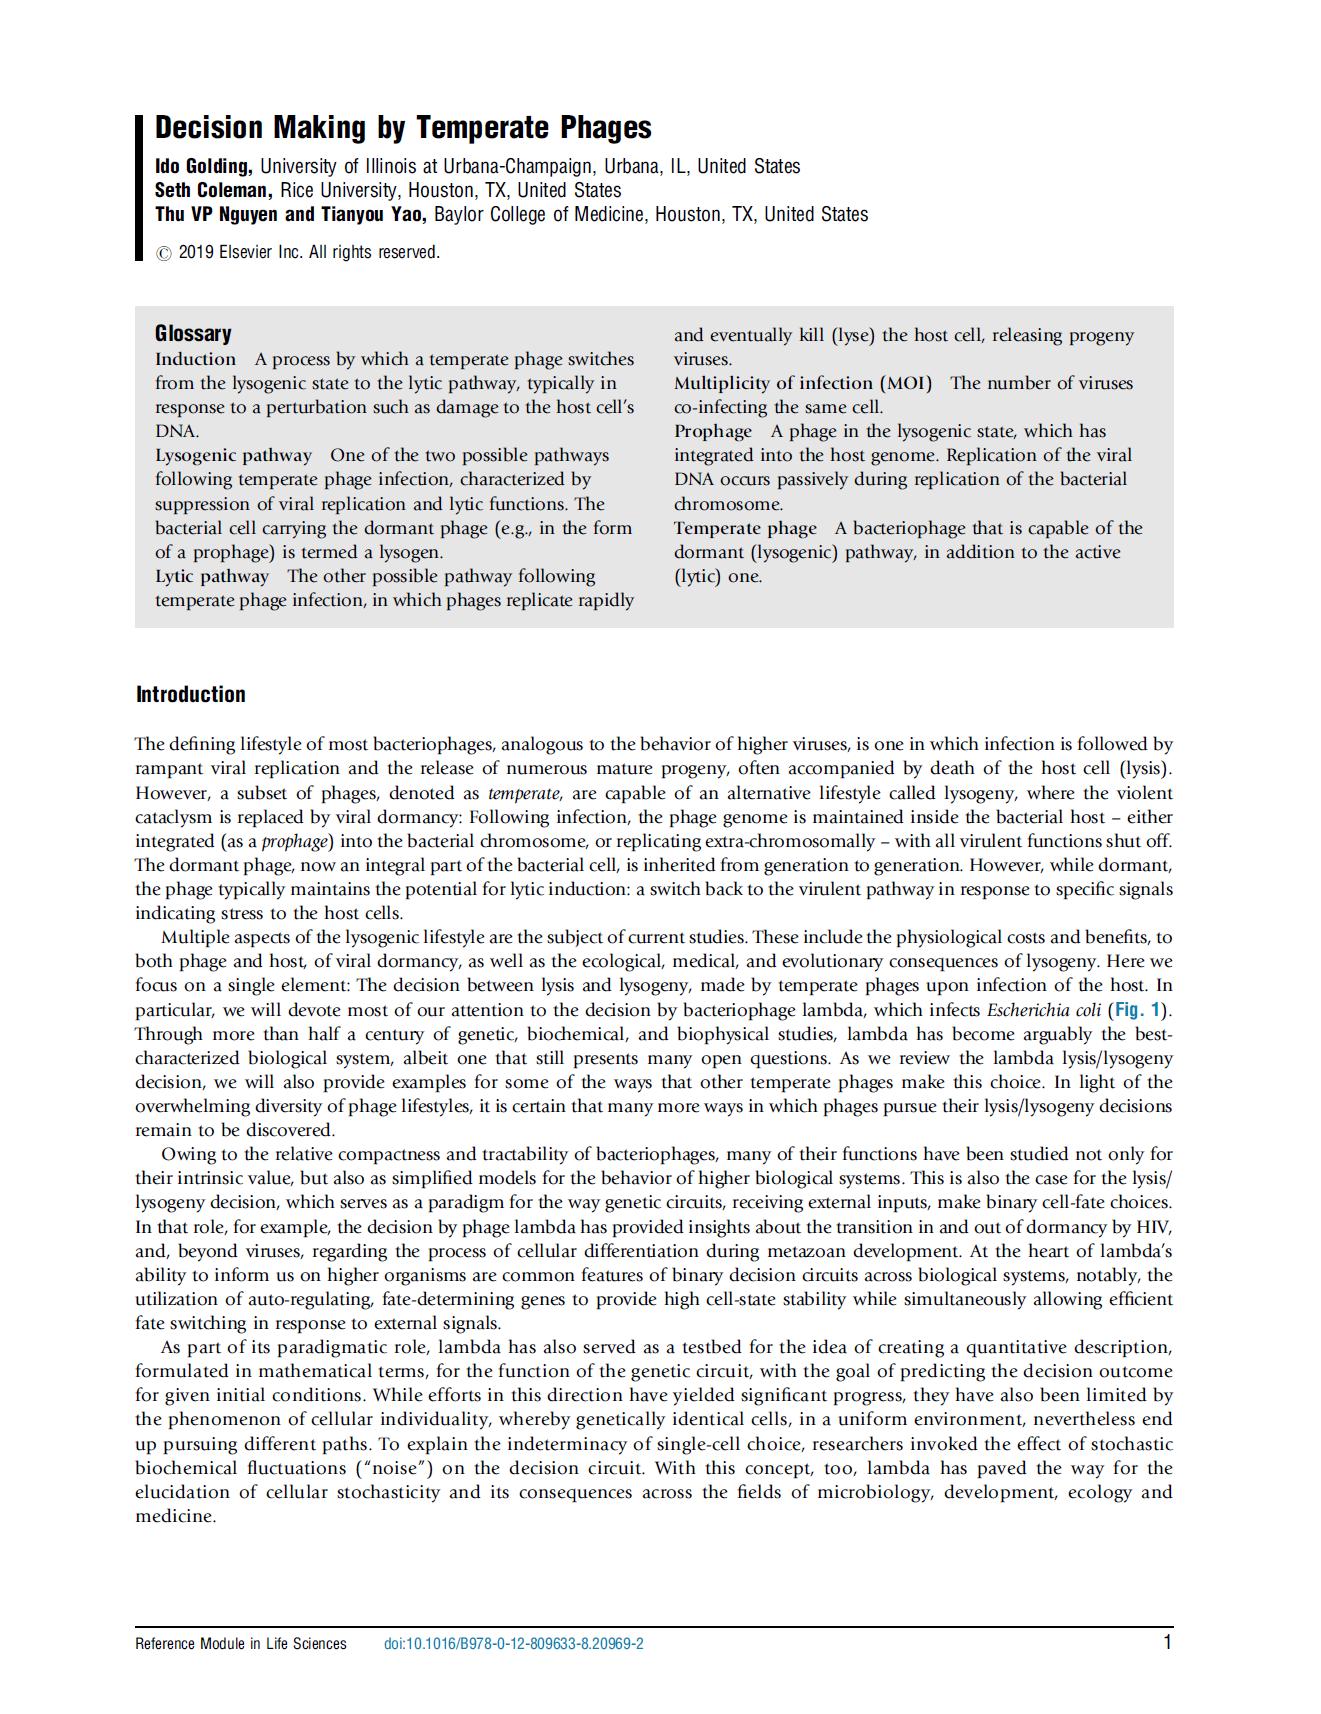 Golding et al., Encycl. Virol. 2019 [PDF]